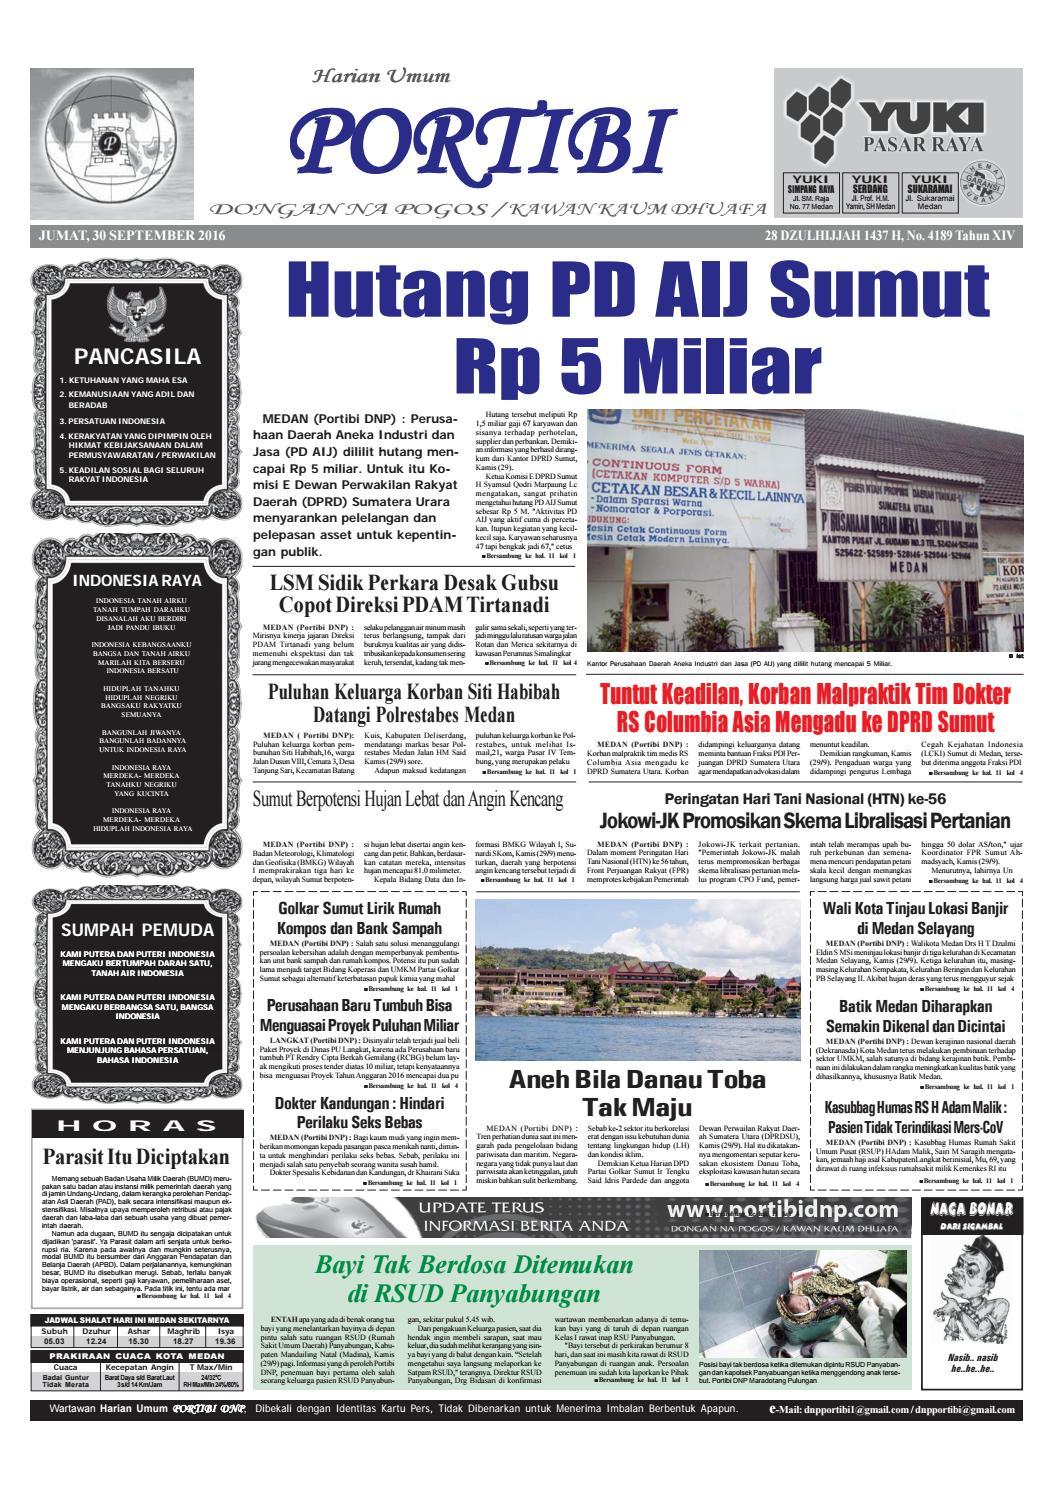 Portibi Dnp By Adhitya Fahlan Issuu Produk Ukm Bumn Kain Batik Middle Premium 3 Bendera 01